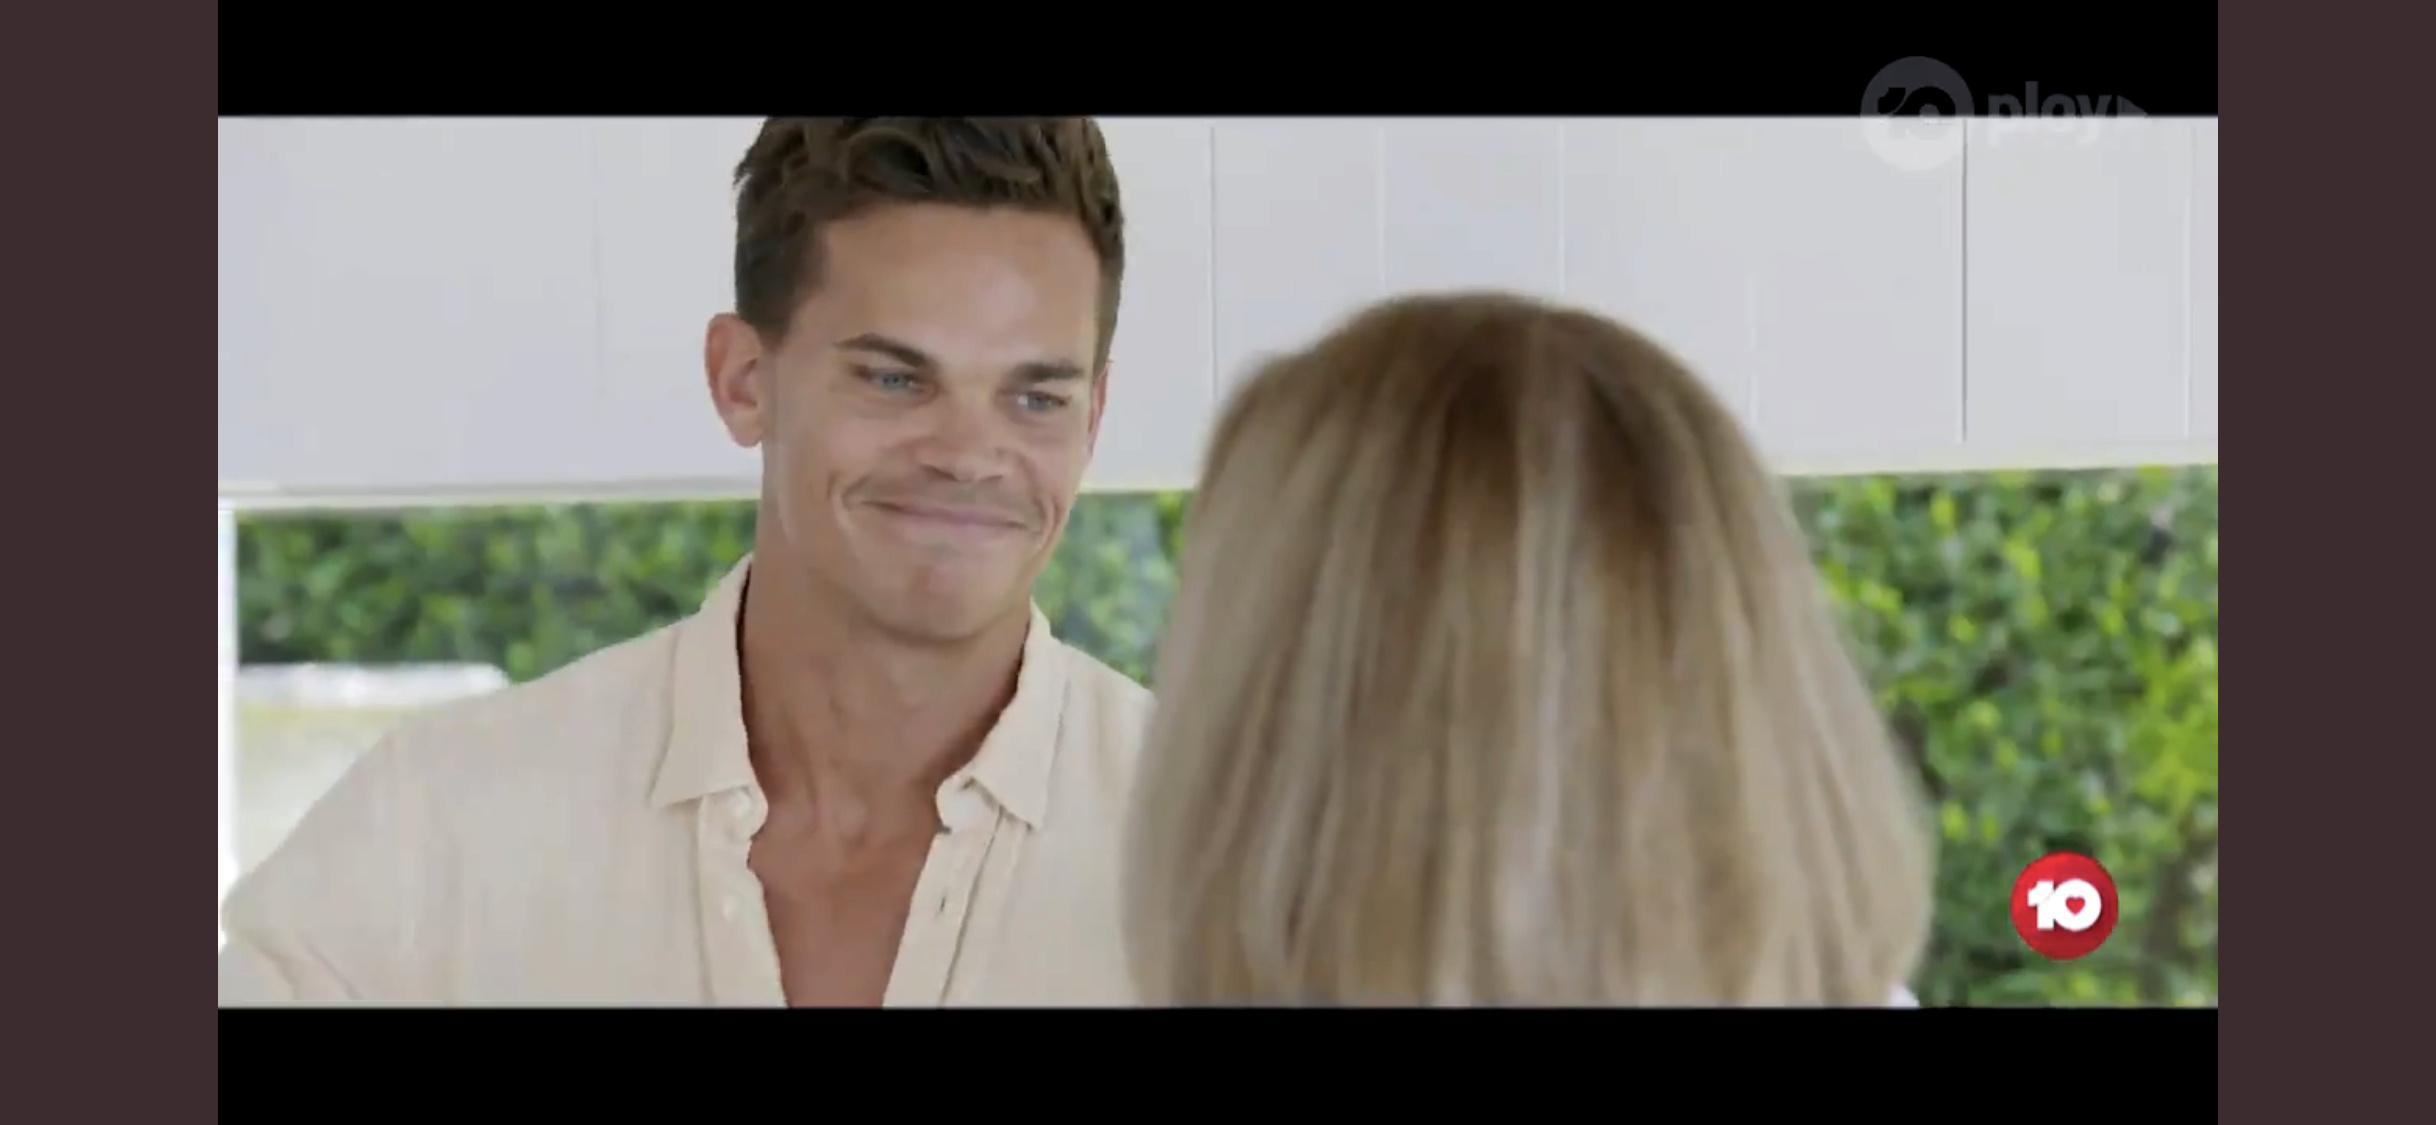 Bachelor Australia - Season 9 - Jimmy Nicholson - S/Caps - *Sleuthing Spoilers*  Img_3515